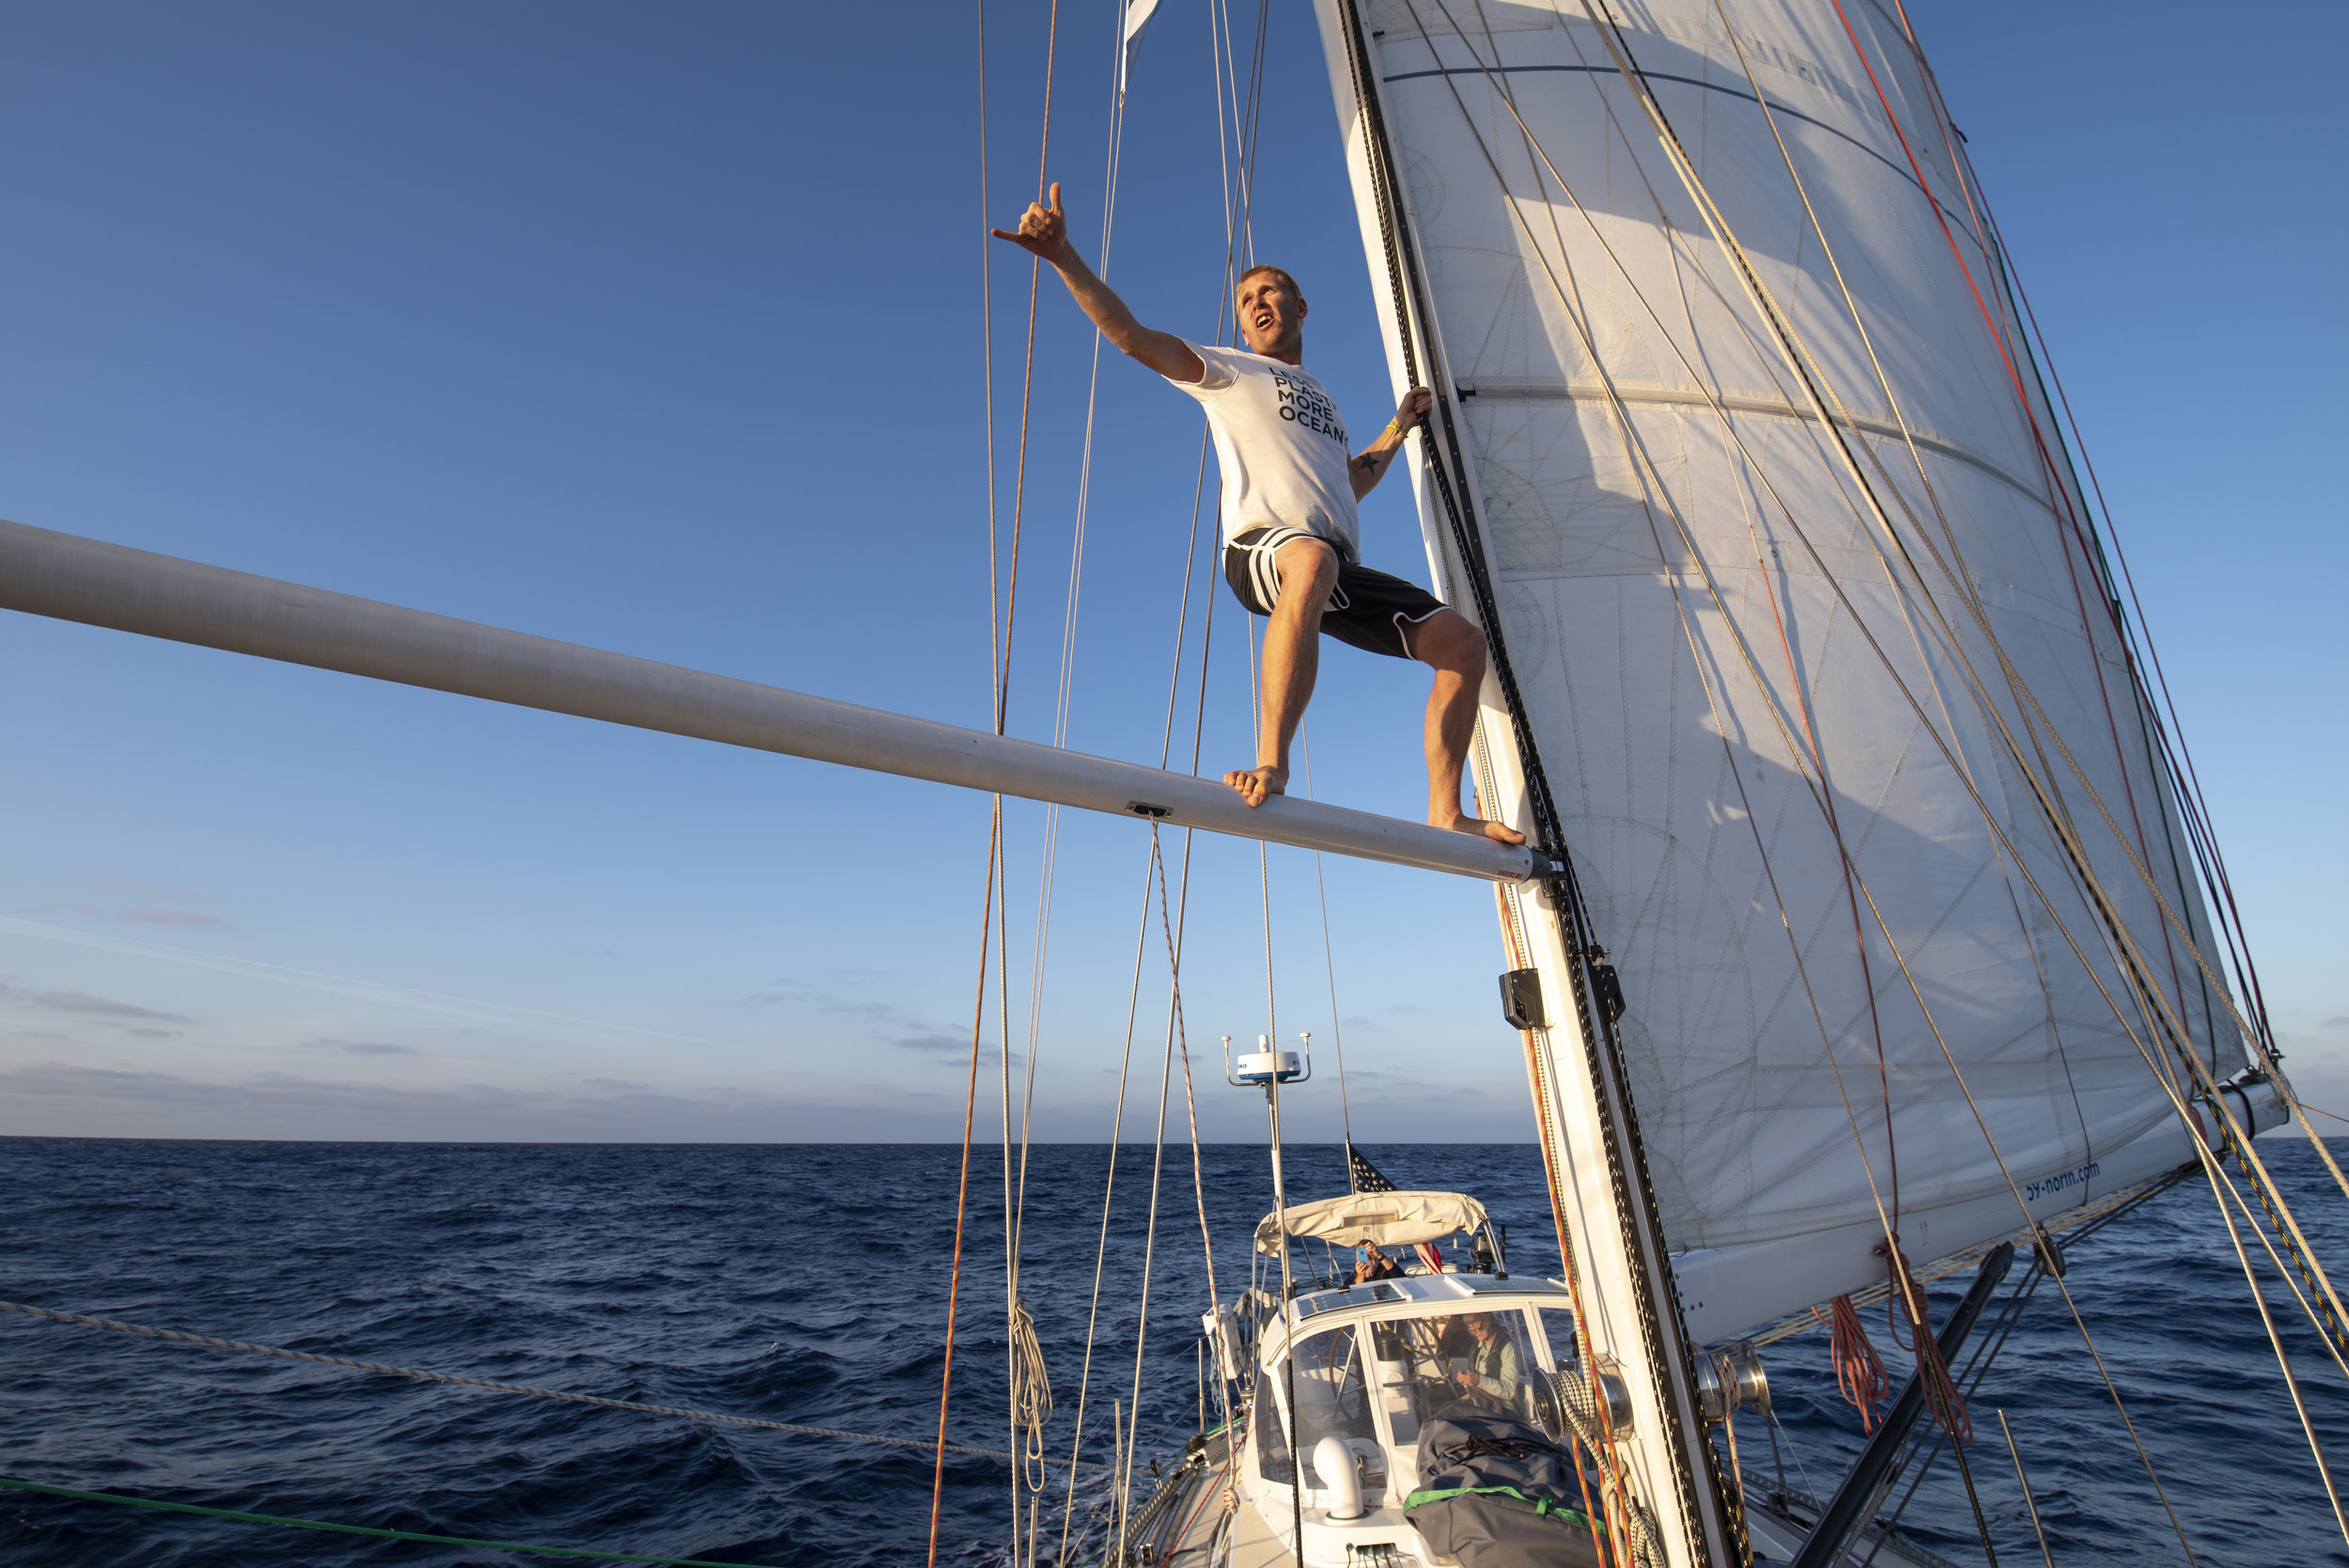 Surf's up! 48-foot longboard…